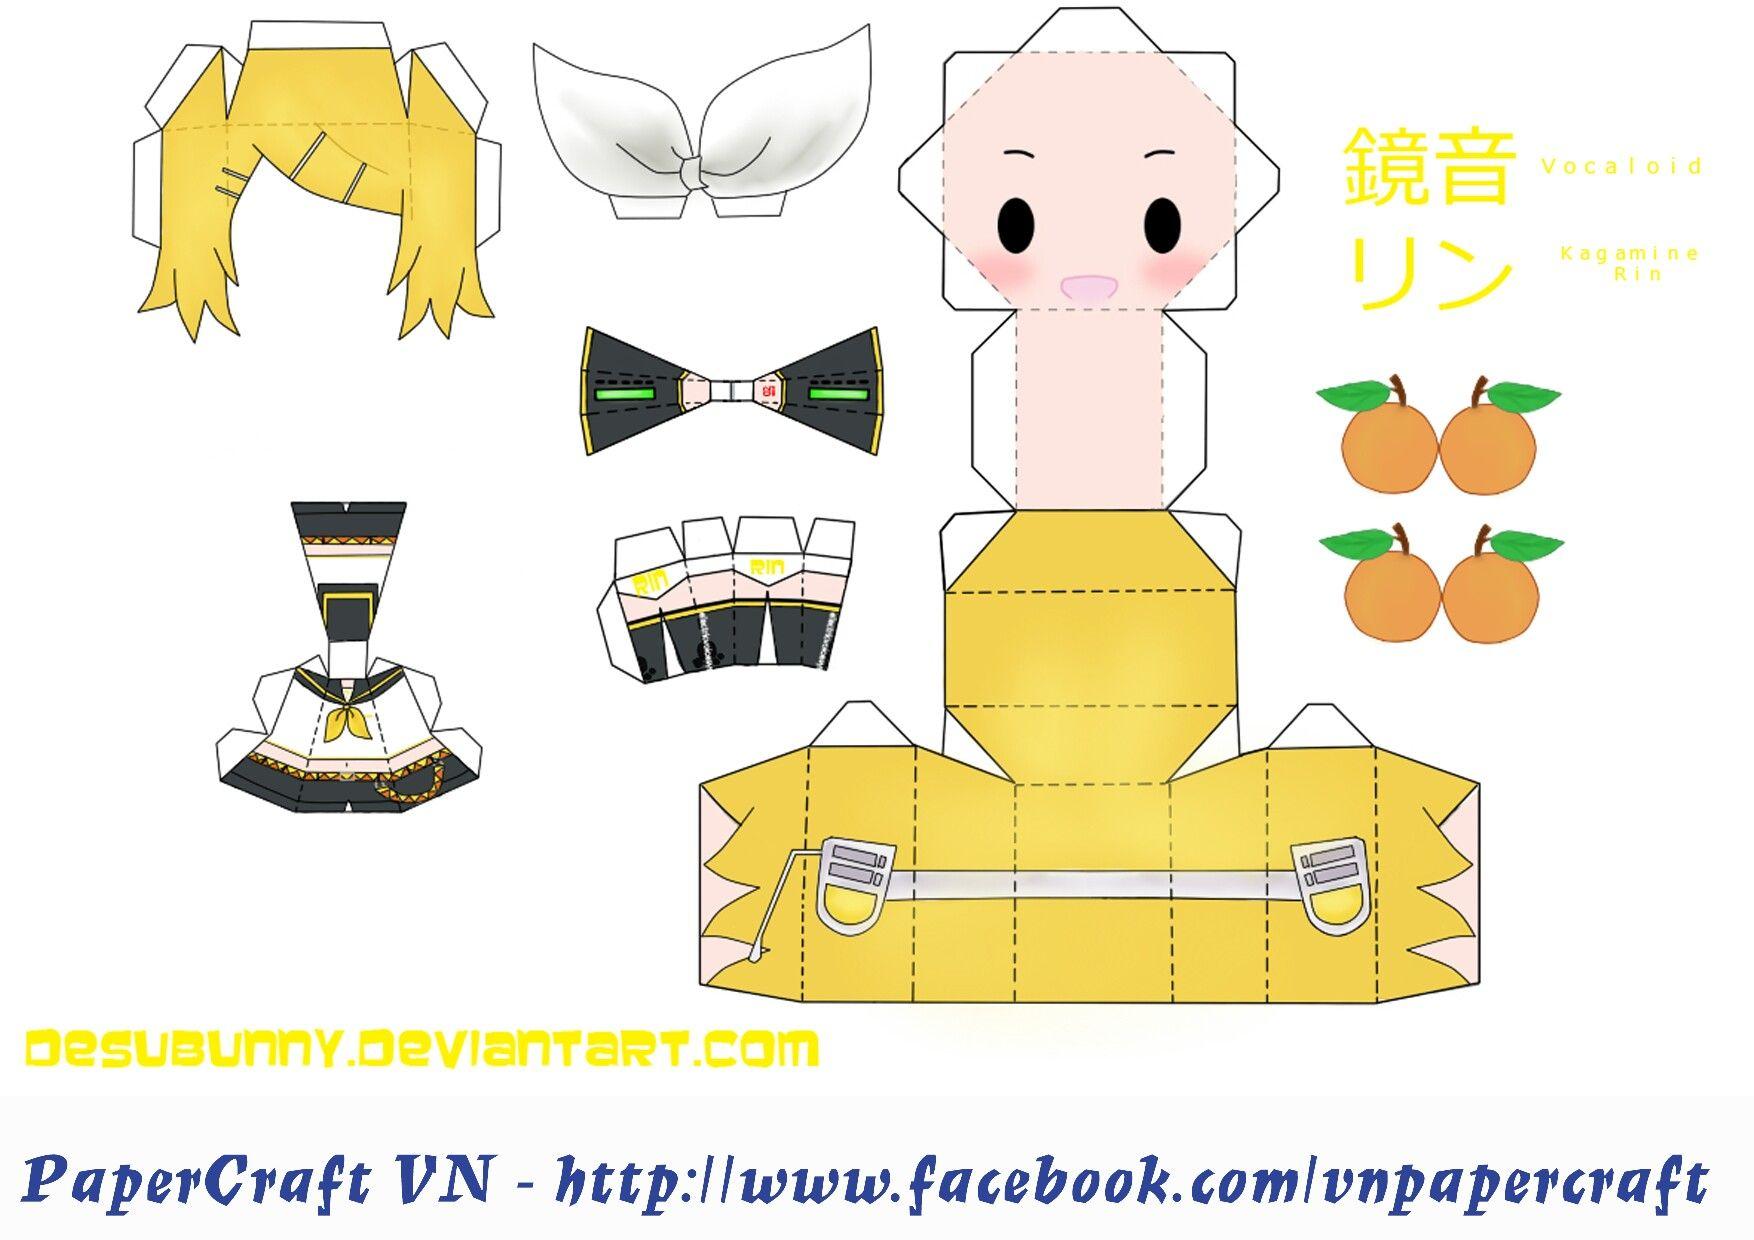 Cute Crafts Diy Printable Box Anime Chibi Vocaloid Papercraft Nerdy Birthday Ideas Homework